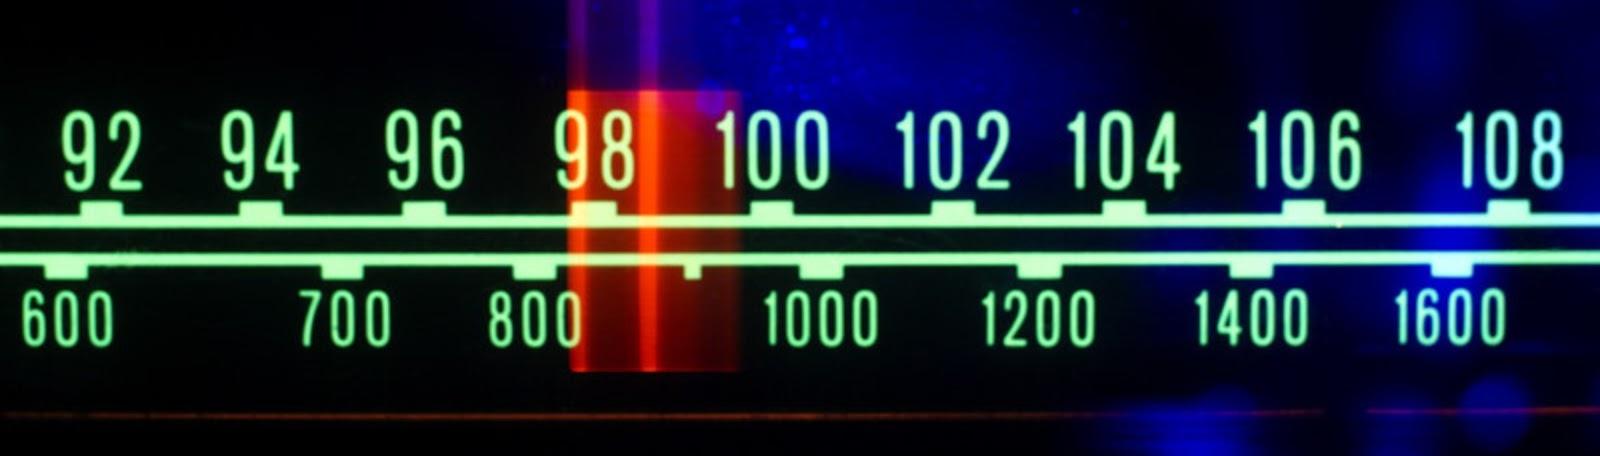 101.ru Disco 80x - Russia - Live Streaming - Delicast